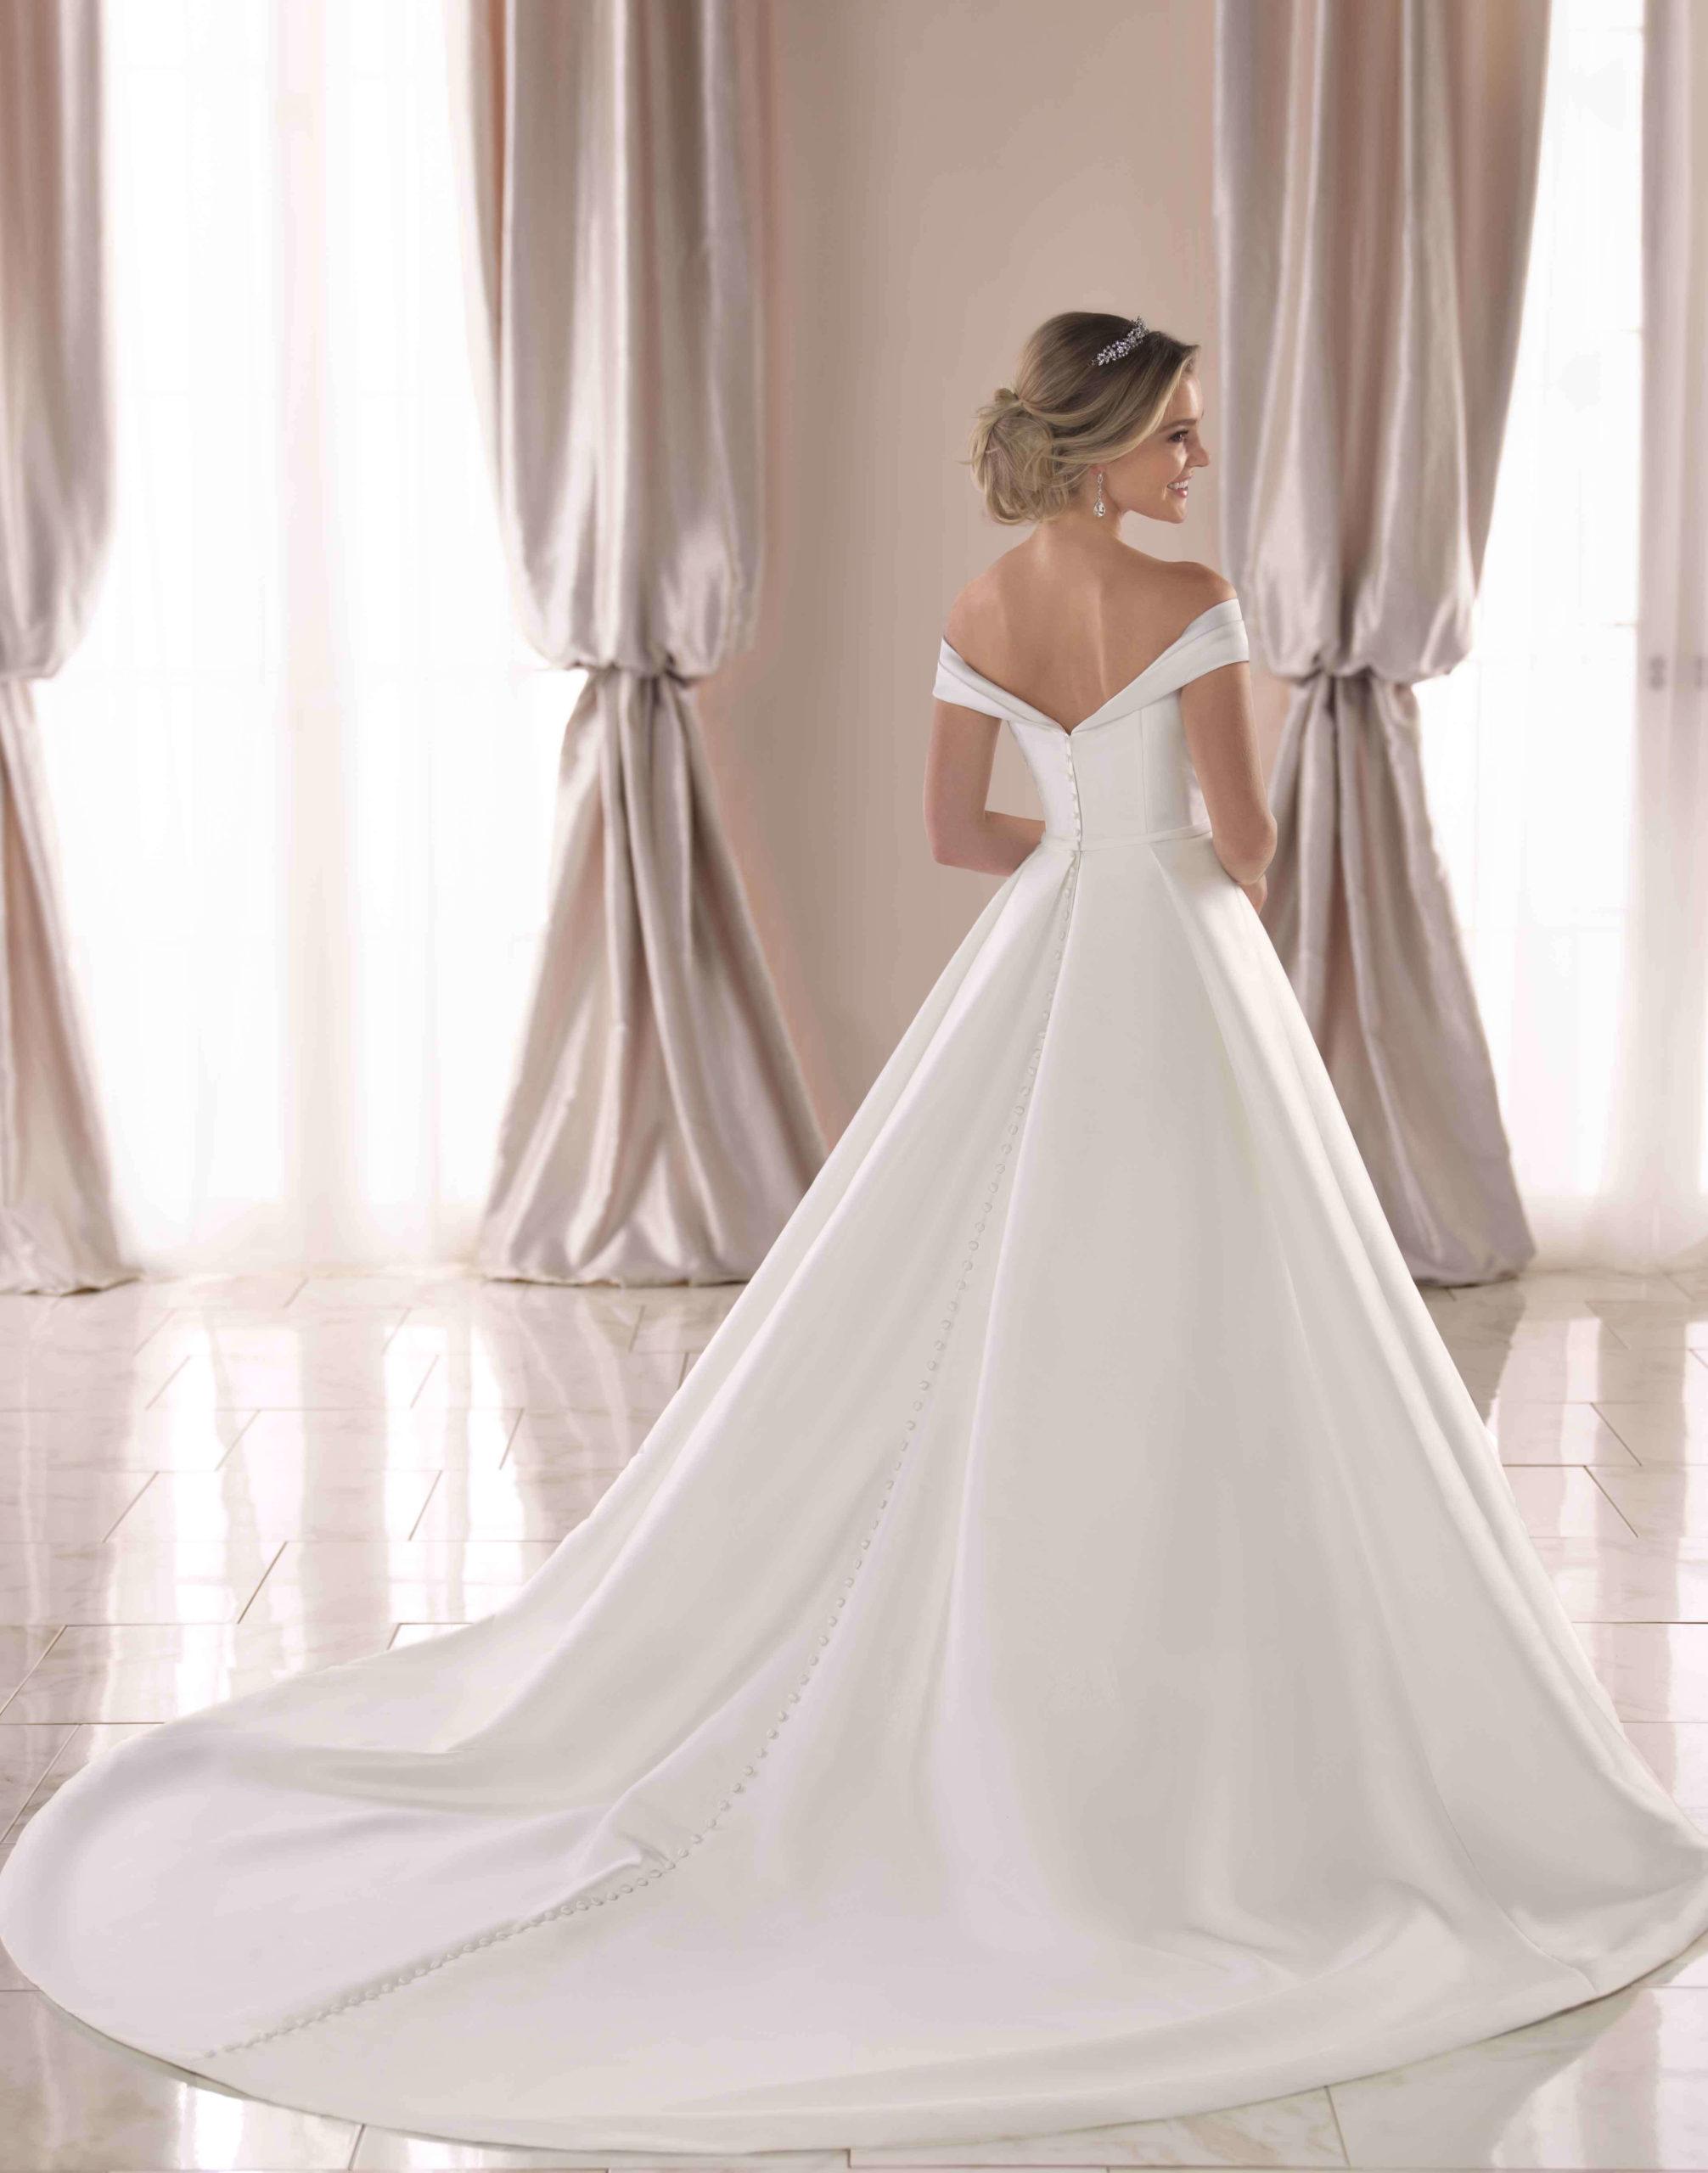 6865 – Stella York Wedding Dress Collection – Front View